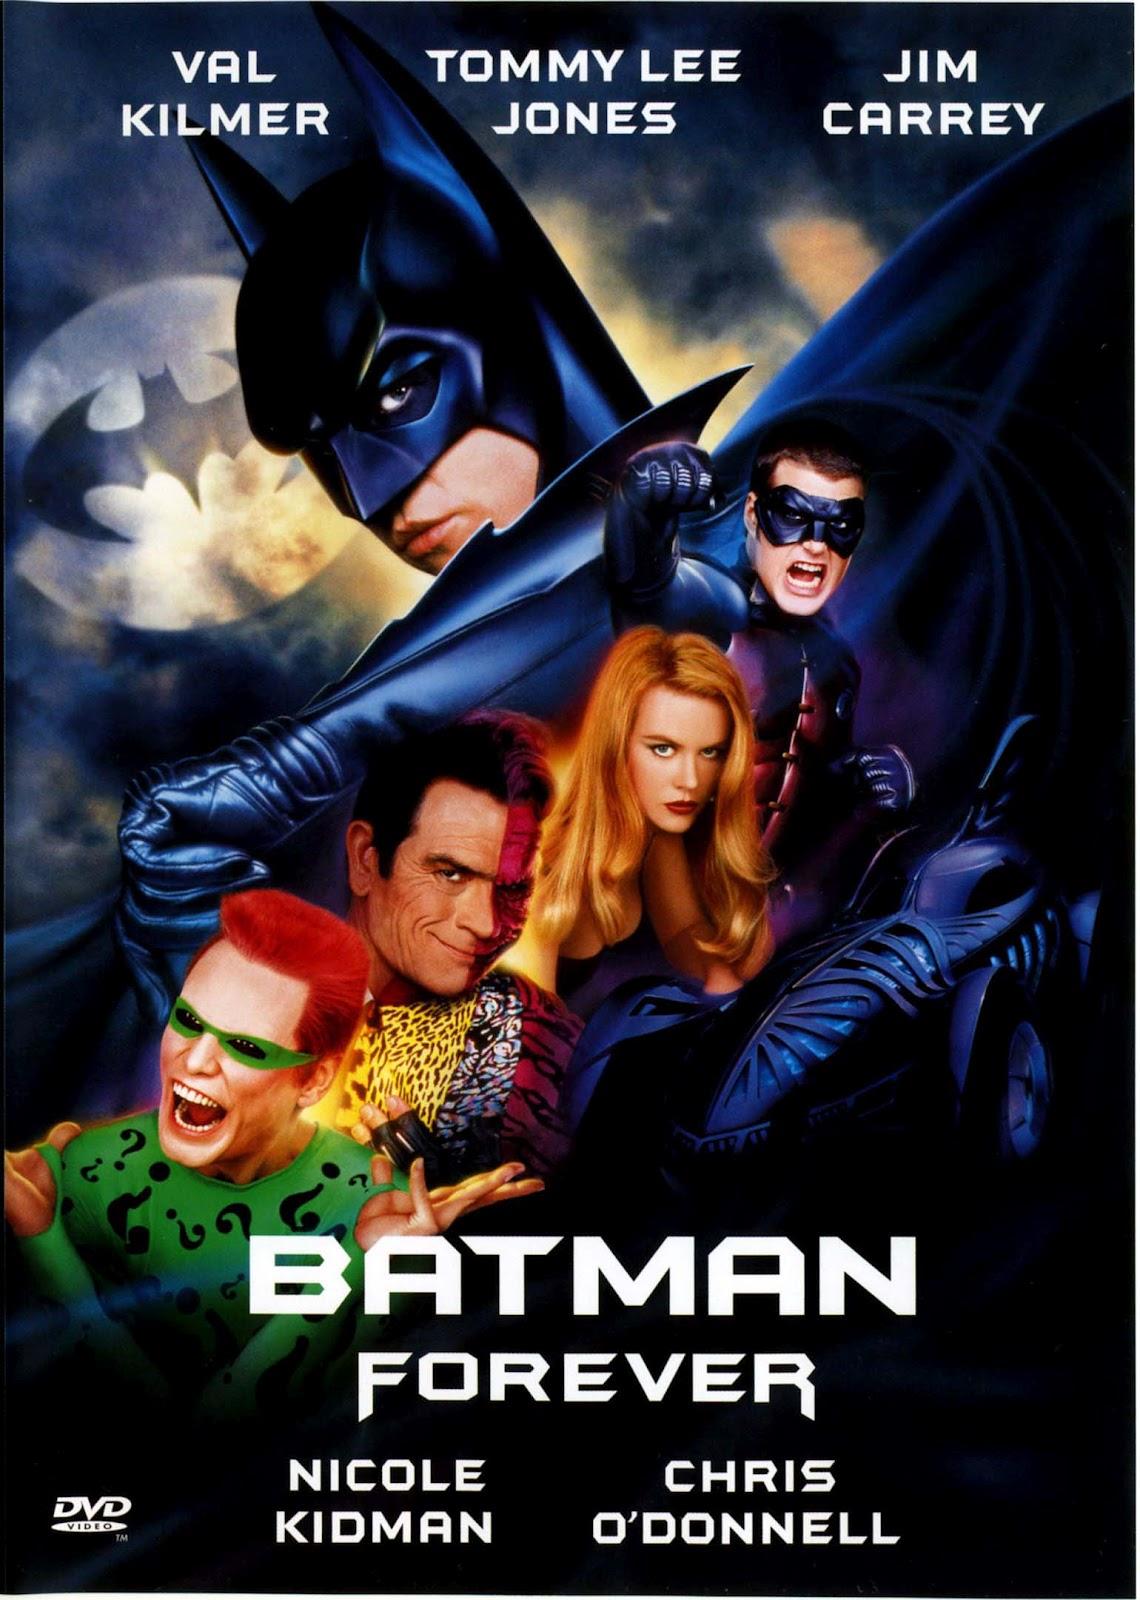 http://2.bp.blogspot.com/-DwMzmiKgIpE/UBcNYfpbPVI/AAAAAAAABYg/f7z_mXy8qt8/s1600/Batman%2BForever.jpg